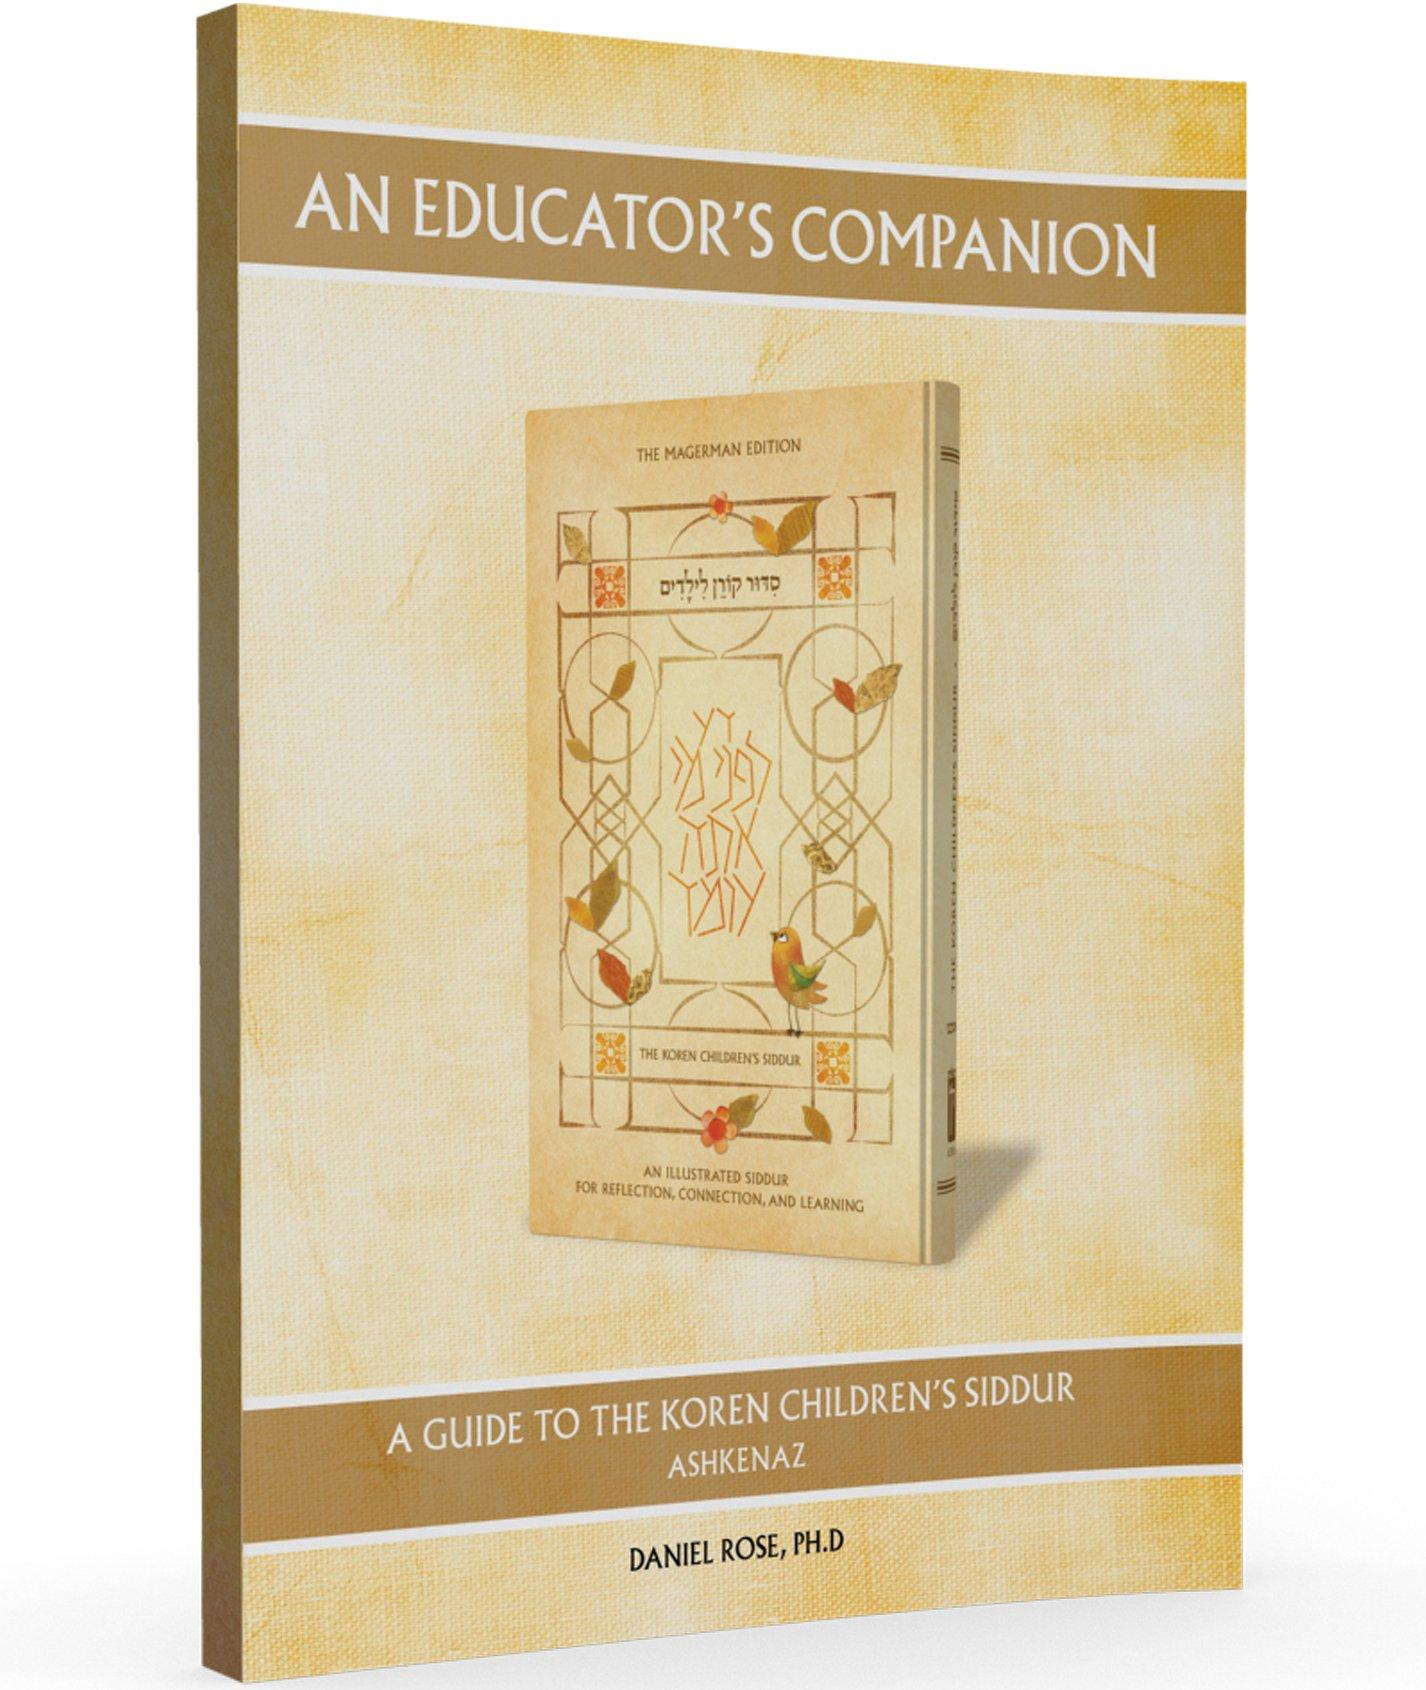 An Educators Companion to Koren Children's Siddur: Ashkenaz